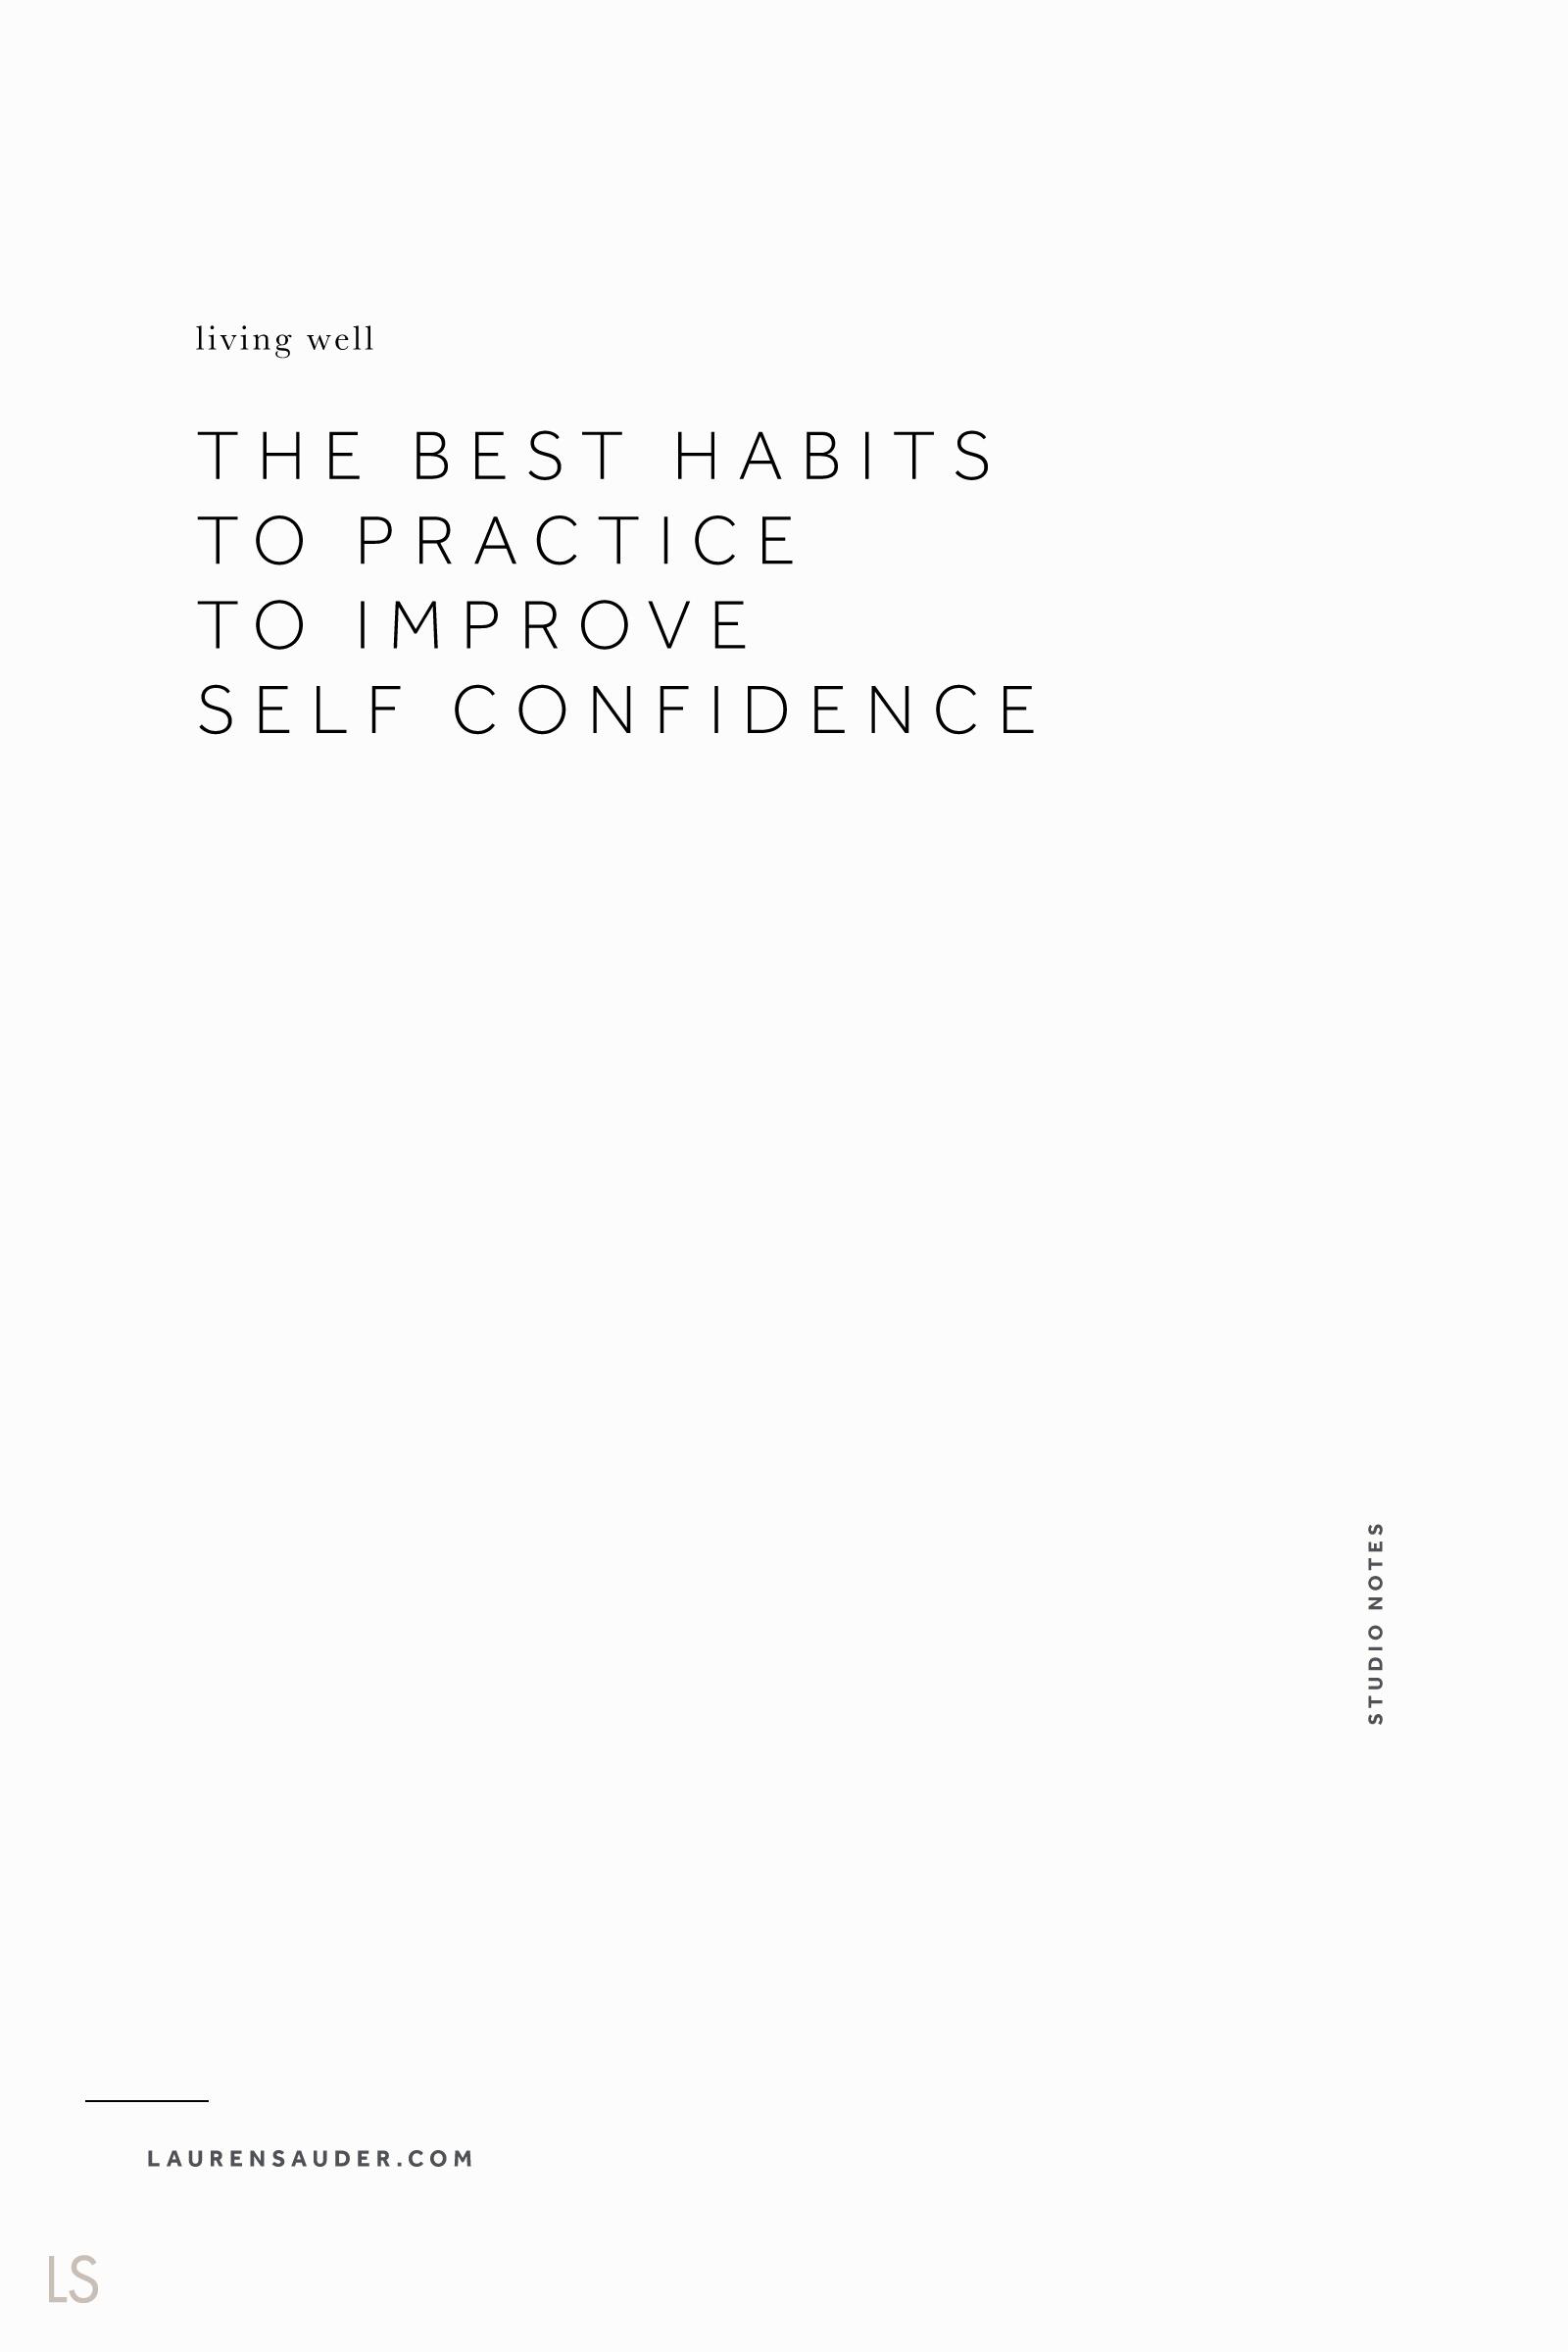 The Best Habits to Practice to Improve Self Confidence - Lauren Sauder confident woman, confident women, self care, daily self care, self care routine, happy life, simple living